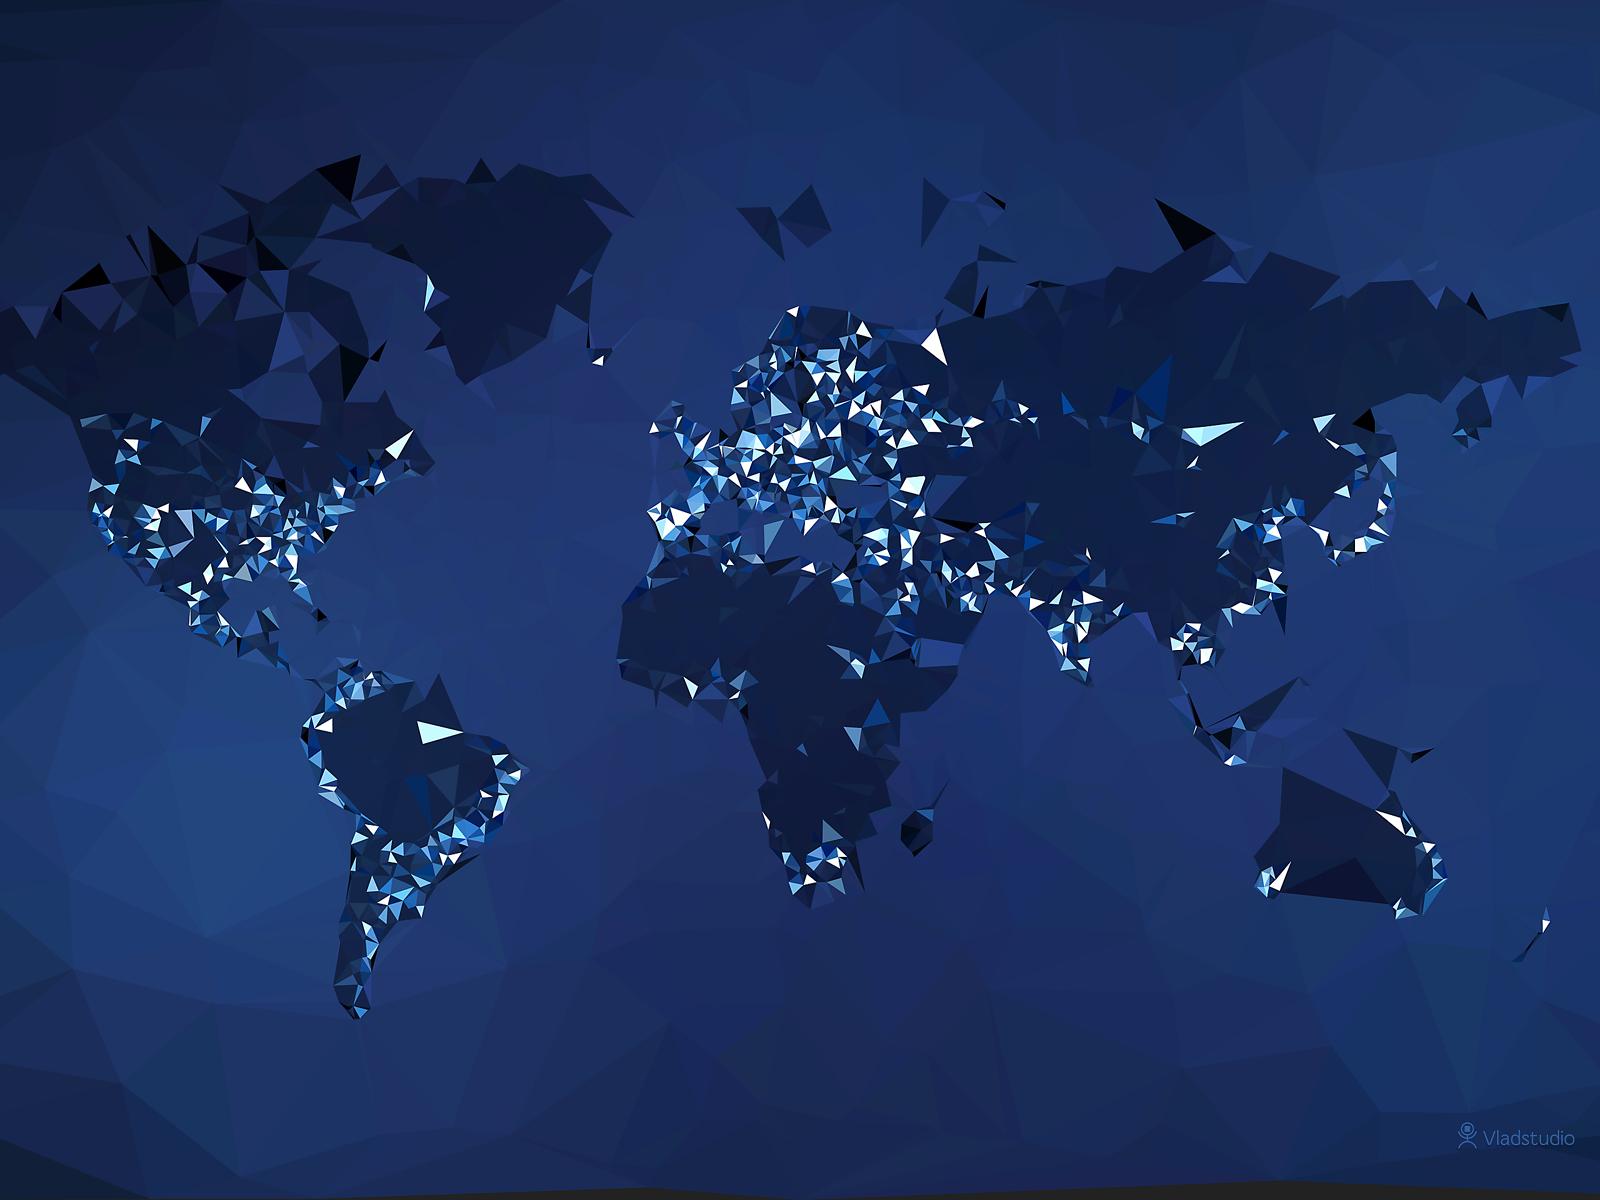 The World Simplified Night by vladstudio on DeviantArt